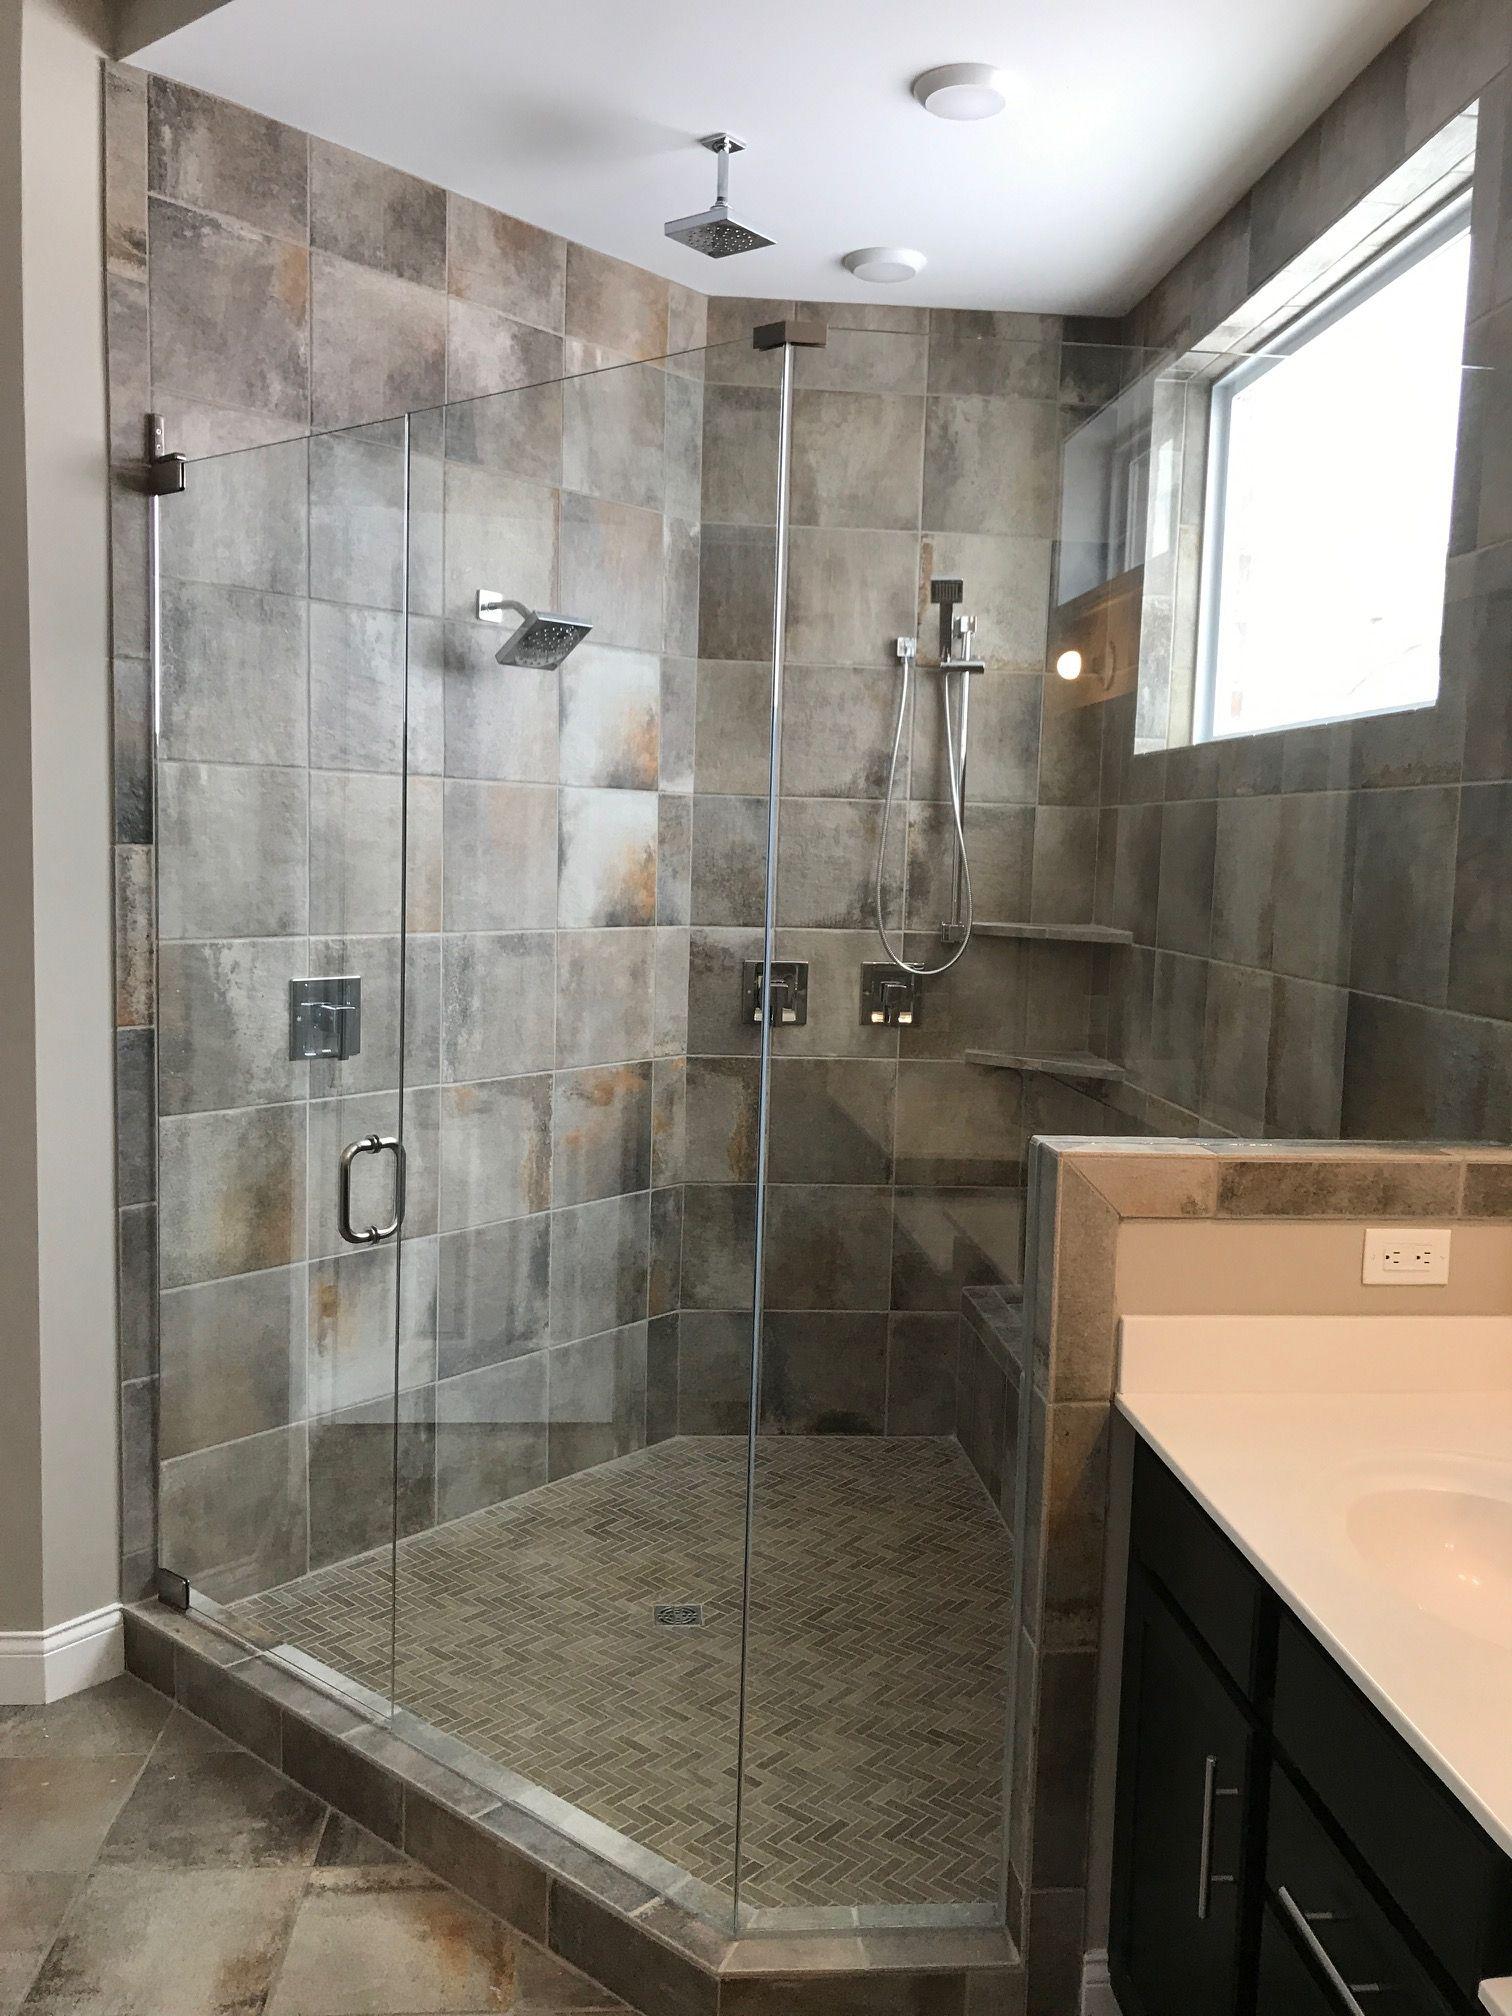 Cotto Contempo Wall Street 13x13 With Woodbridge Wb96 Spruce Tiled Pan Bathtub Remodel Bathroom Design Bathroom